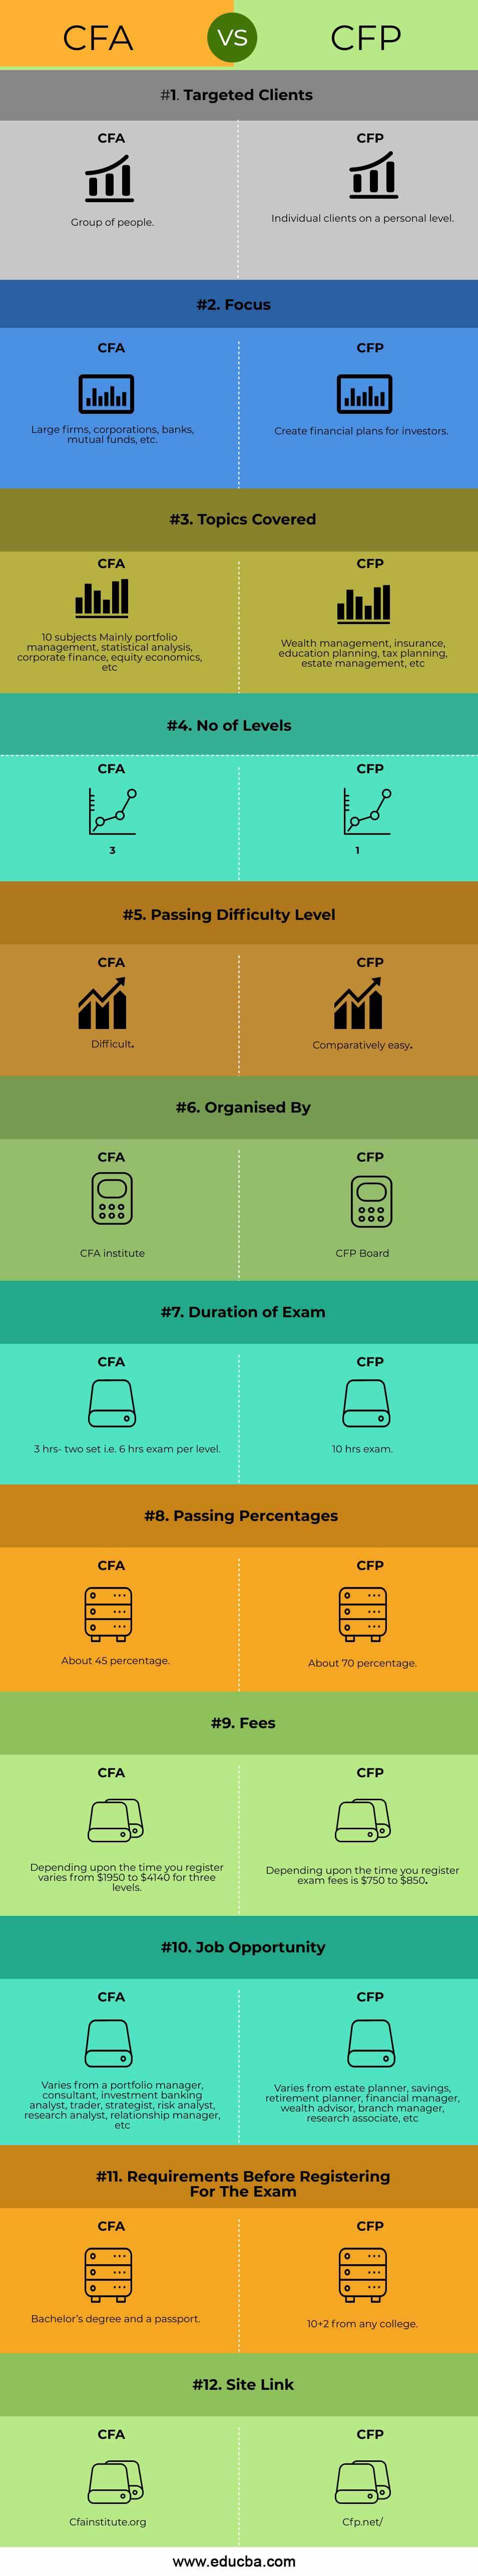 CFA-VS-CFP-info